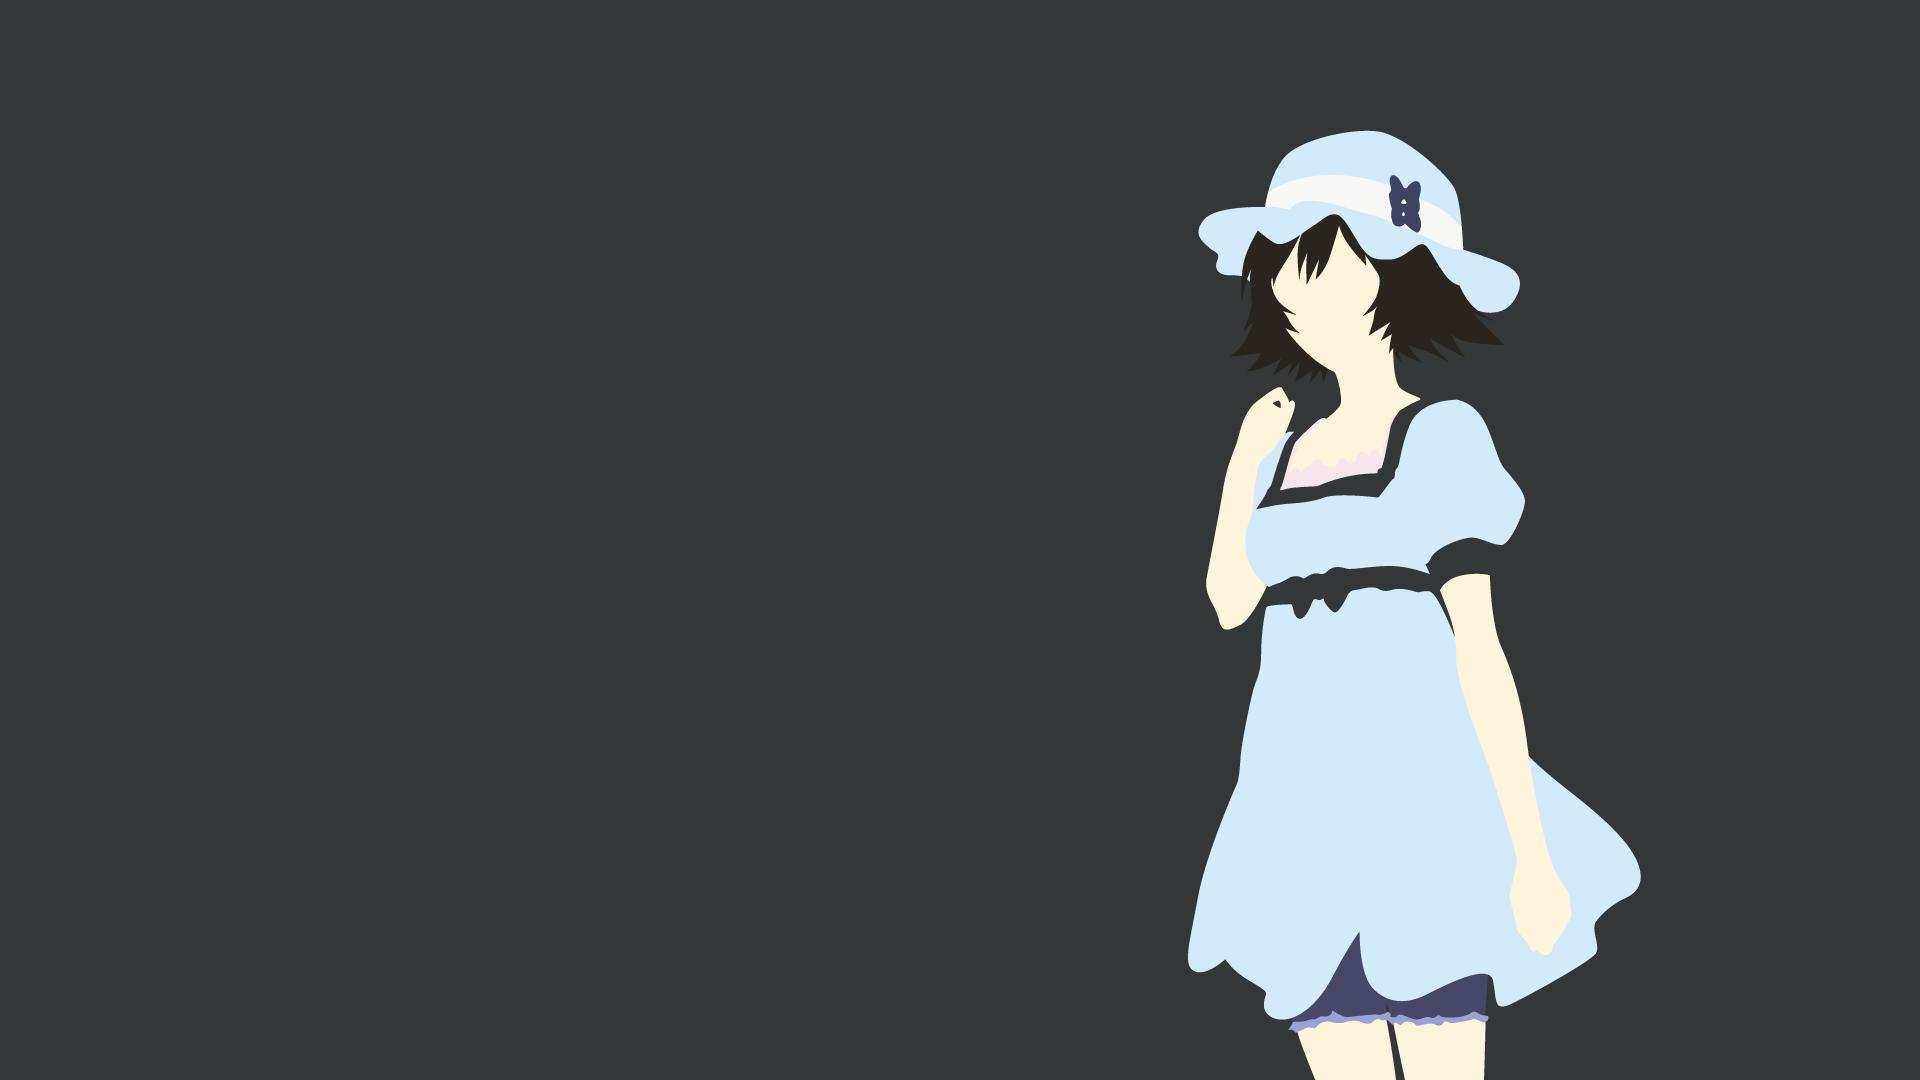 Wallpaper Illustration Anime Girls Minimalism Artwork Cartoon